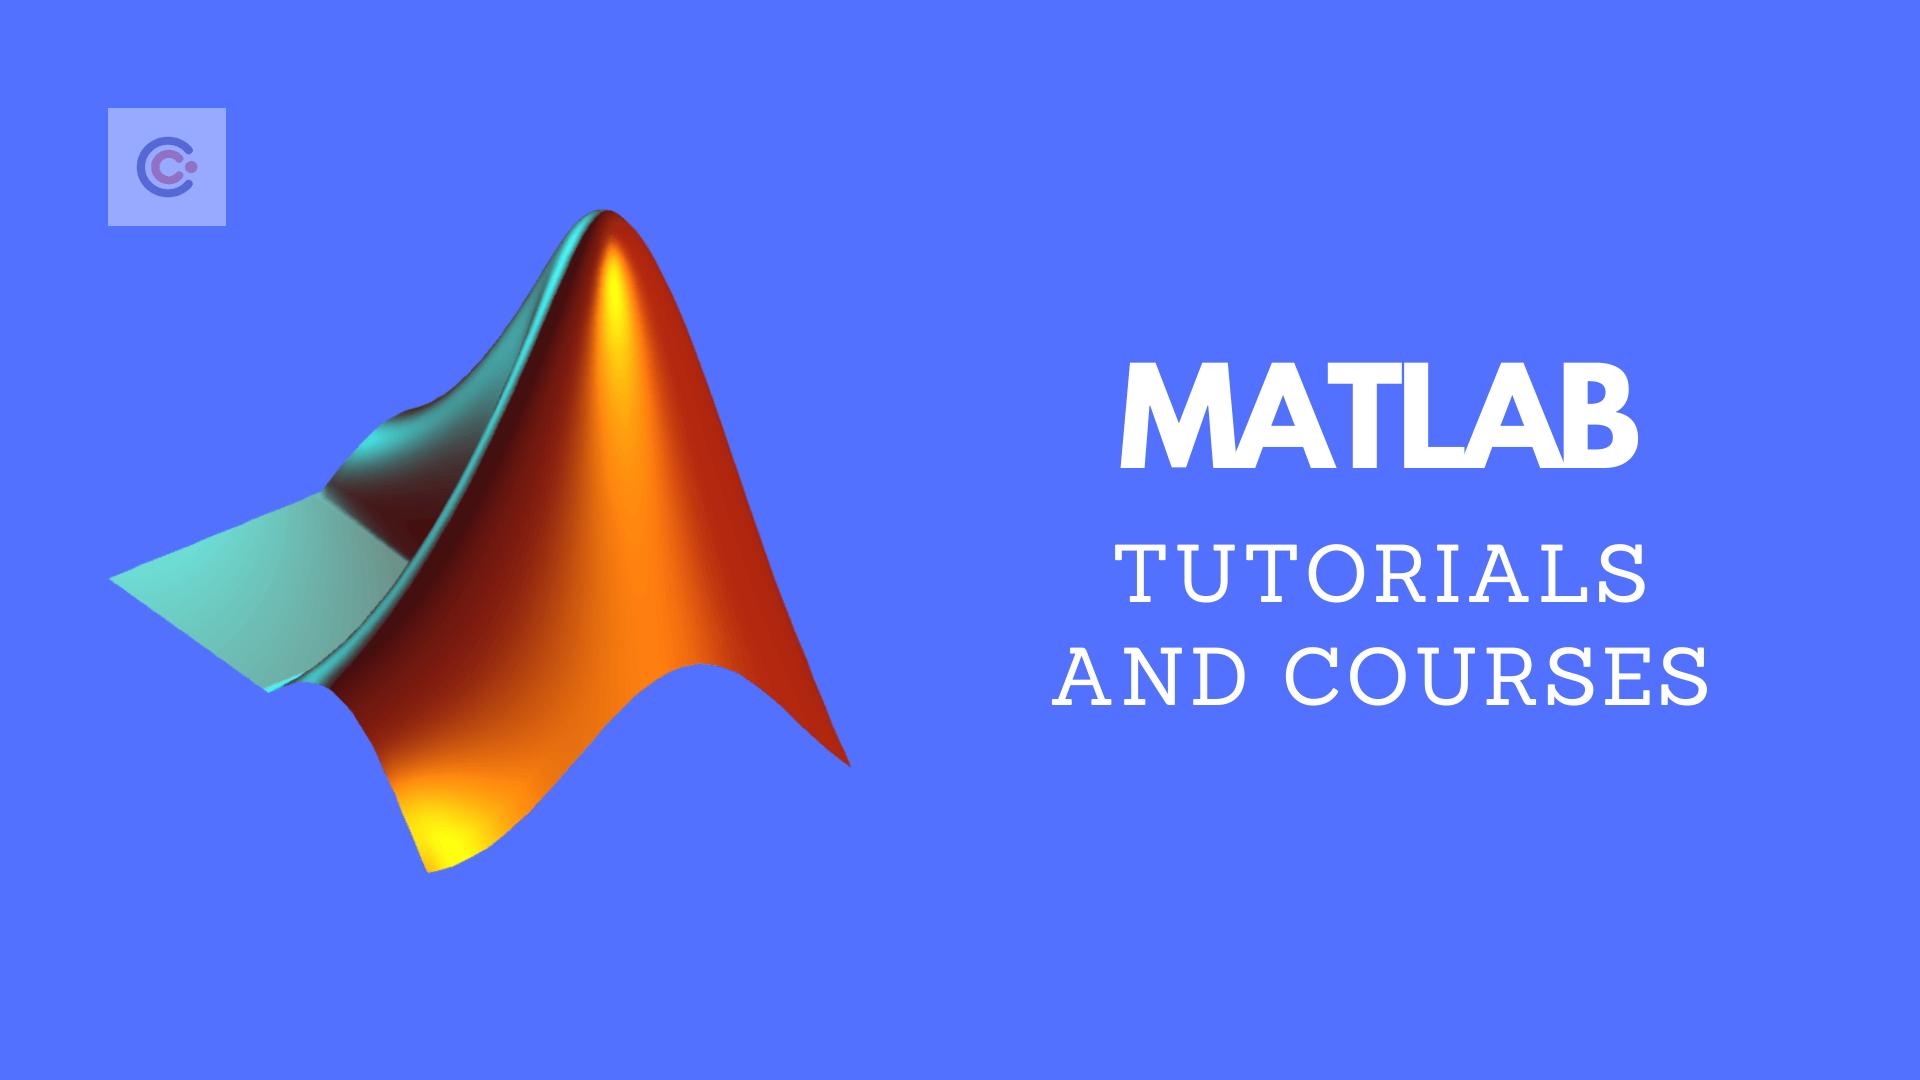 10 Best MATLAB Tutorials & Courses - Learn Matlab Online